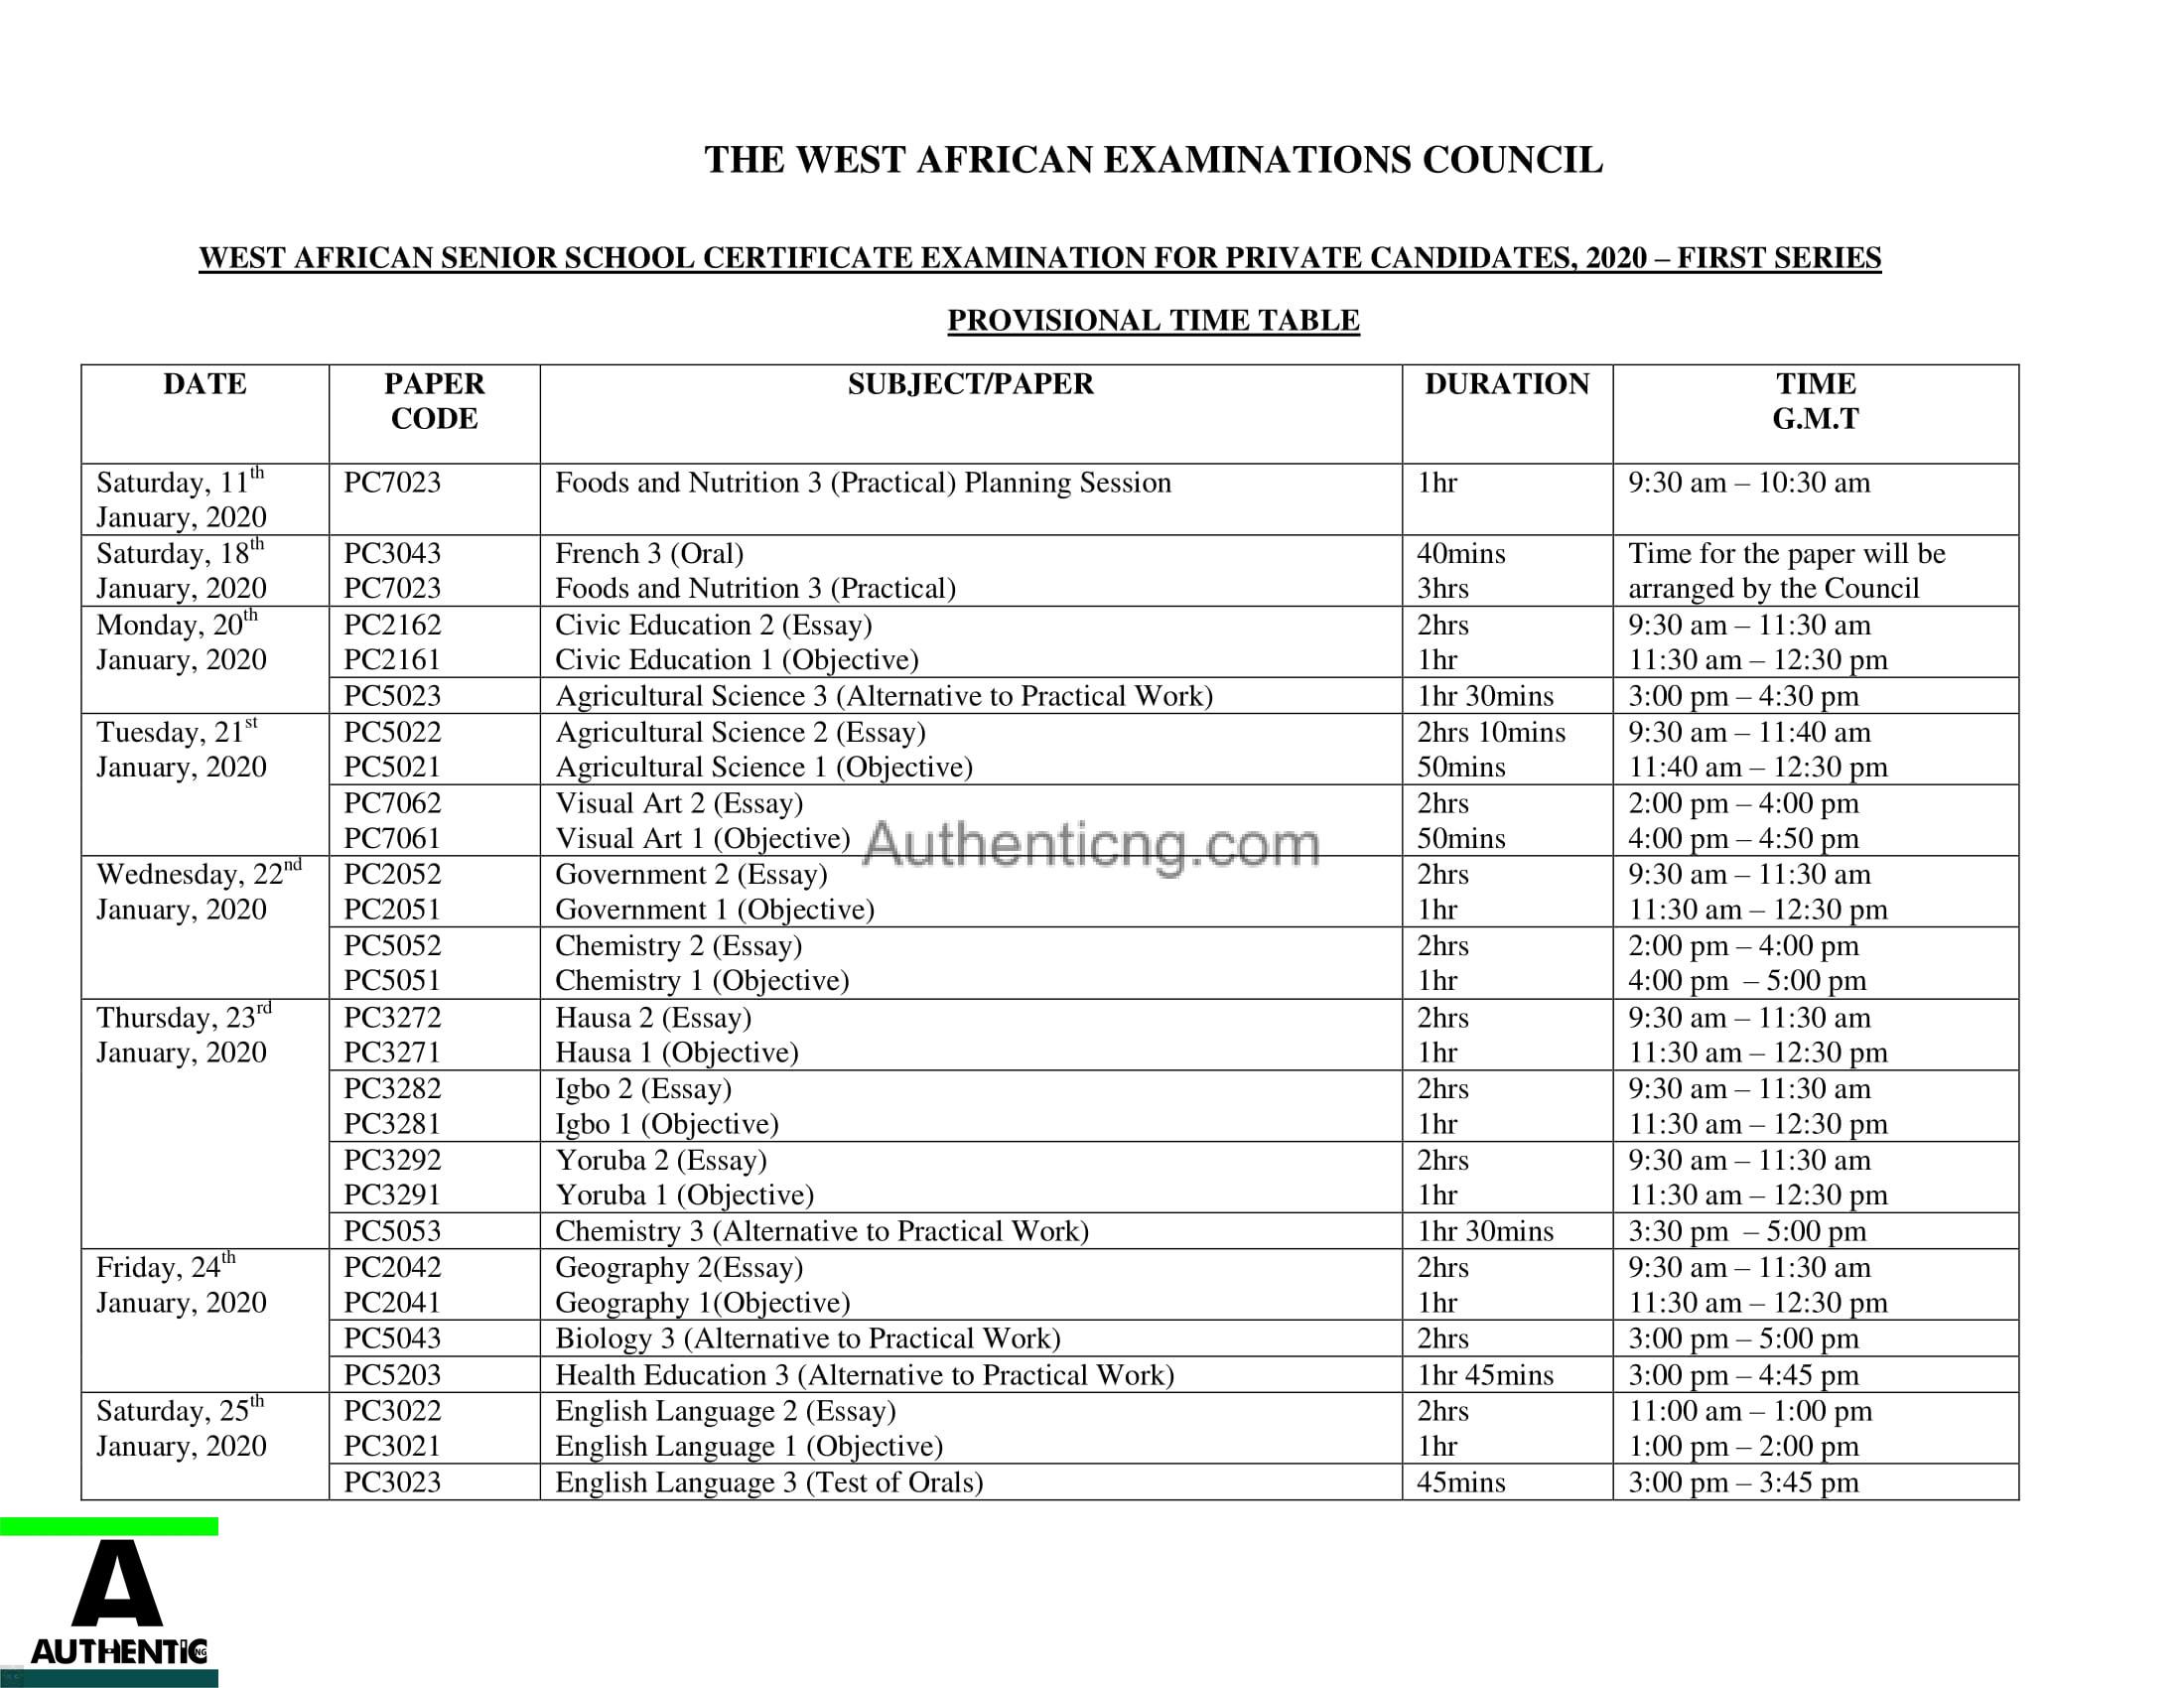 Waec gce 2020 Timetable